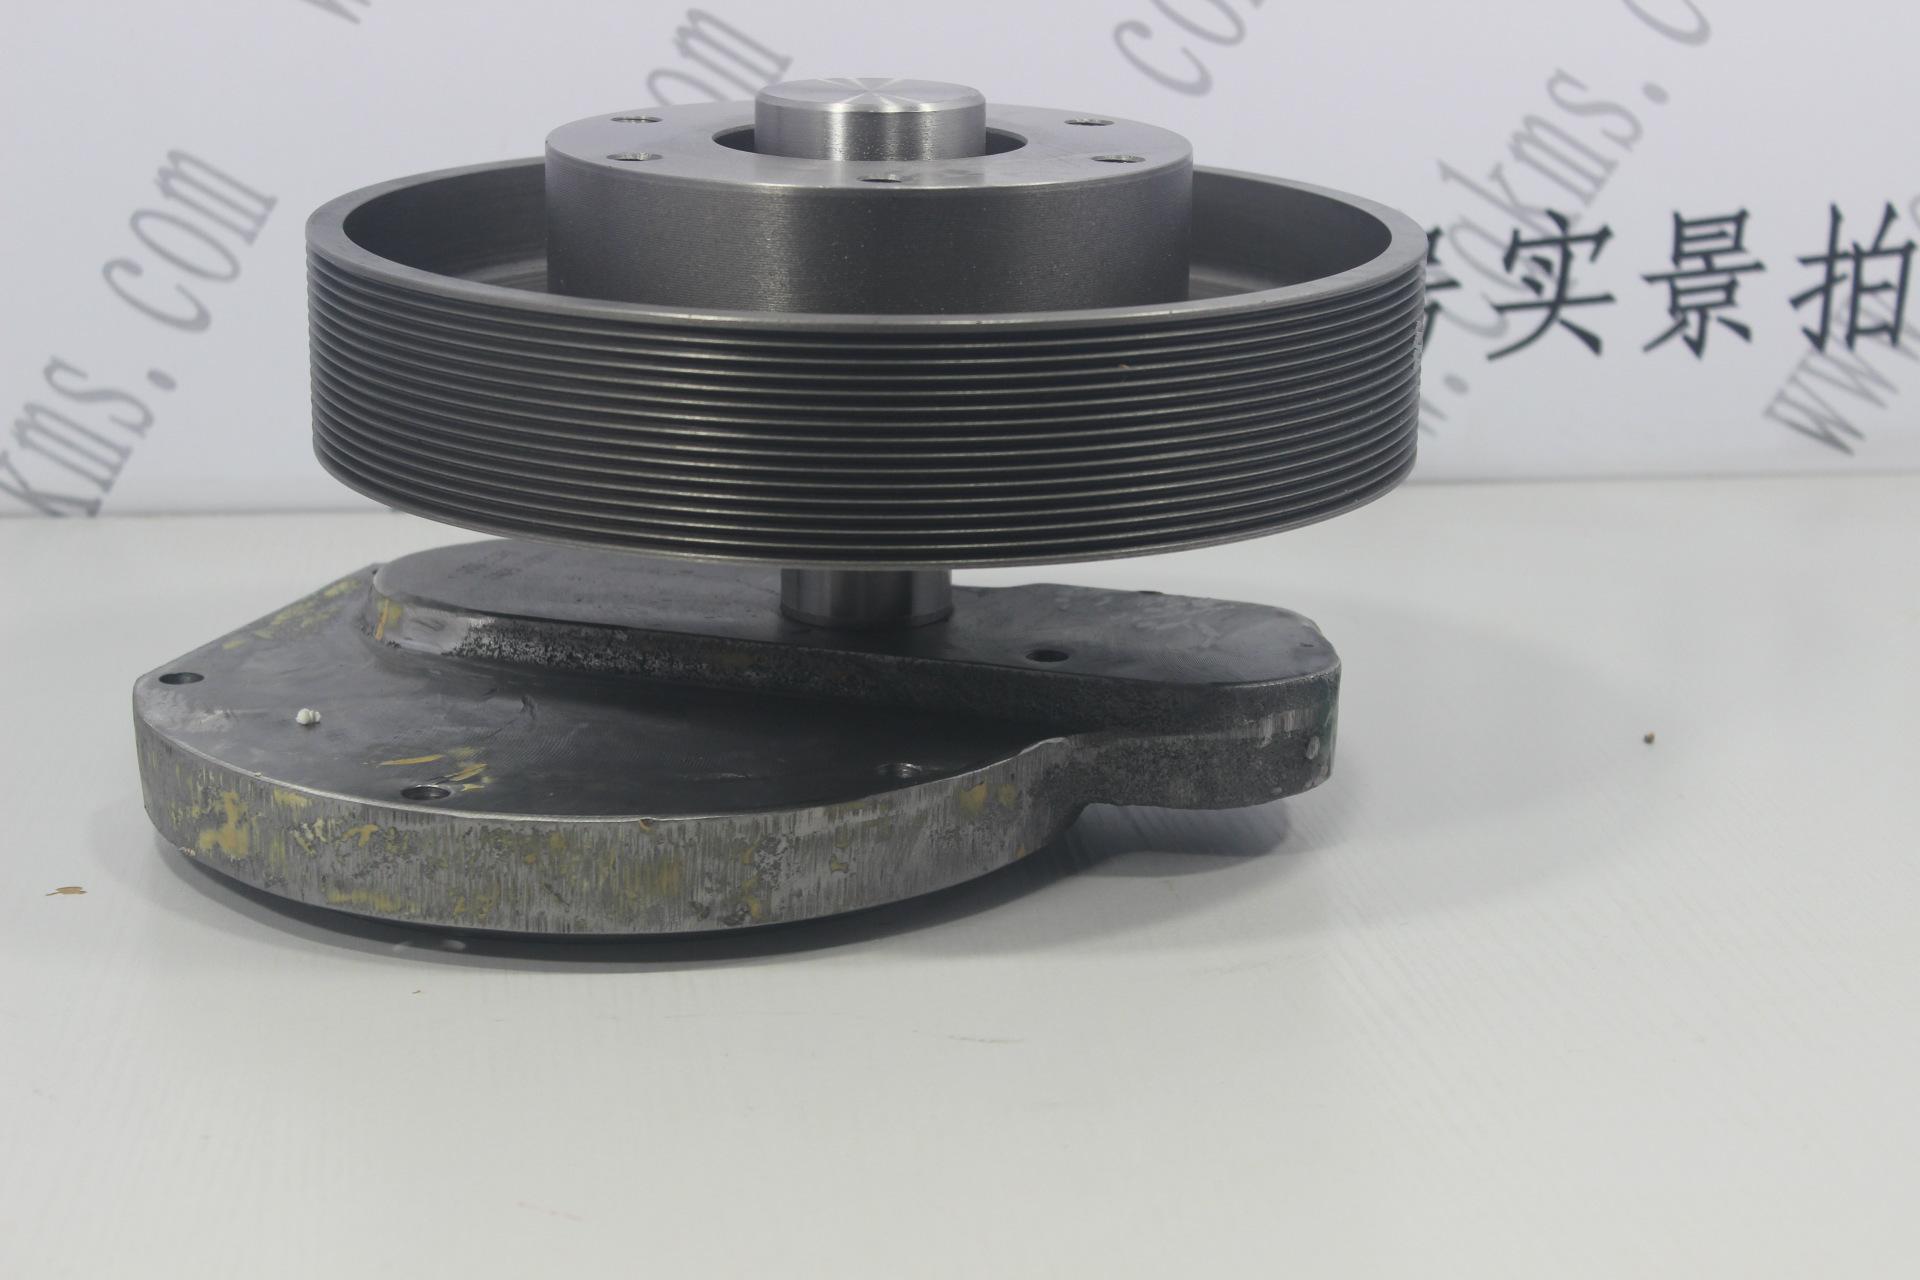 kms06482-3002230-风扇轮毂总成图片6